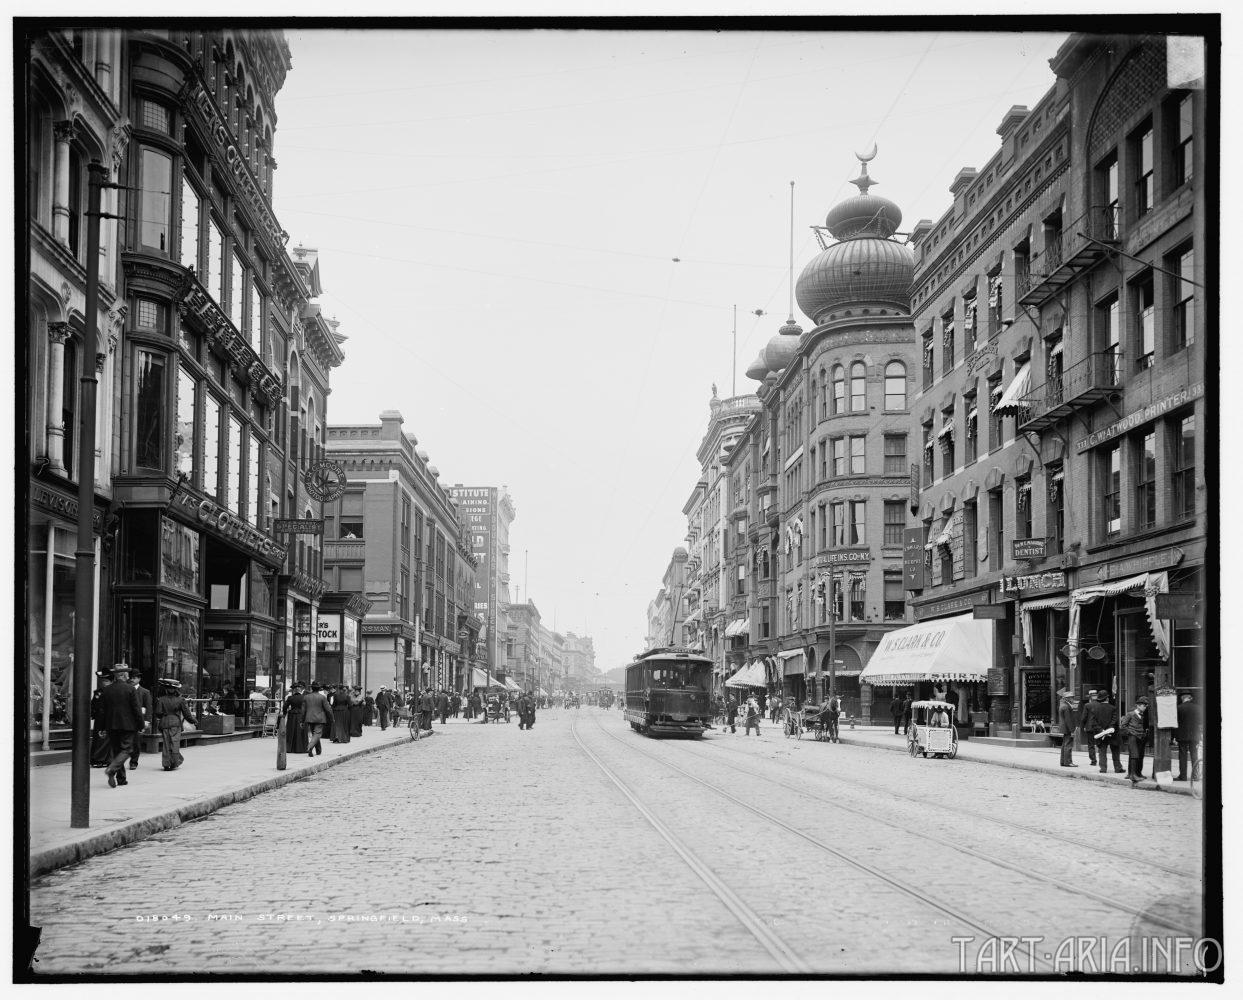 Главная улица города Springfield, штат Massachusetts, США (1905).